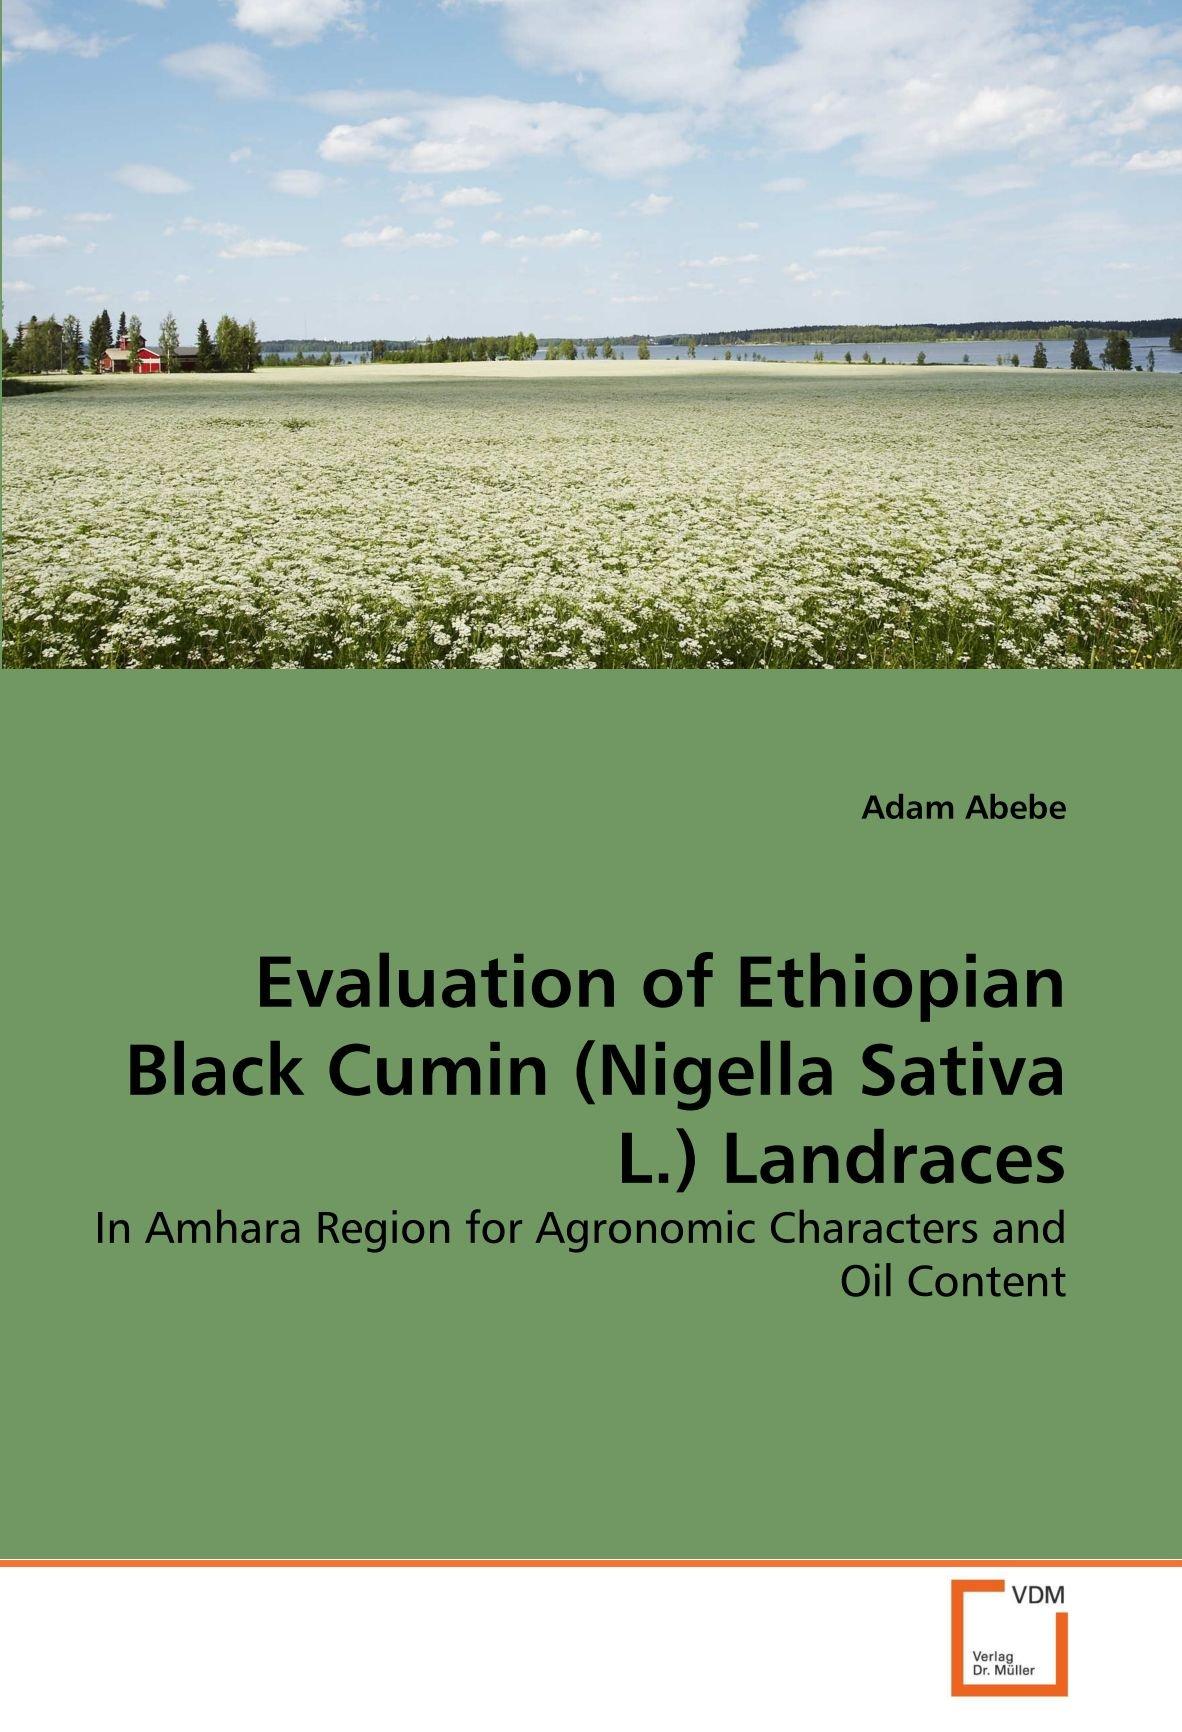 Download Evaluation of Ethiopian Black Cumin (Nigella Sativa L.) Landraces: In Amhara Region for Agronomic Characters and Oil Content PDF